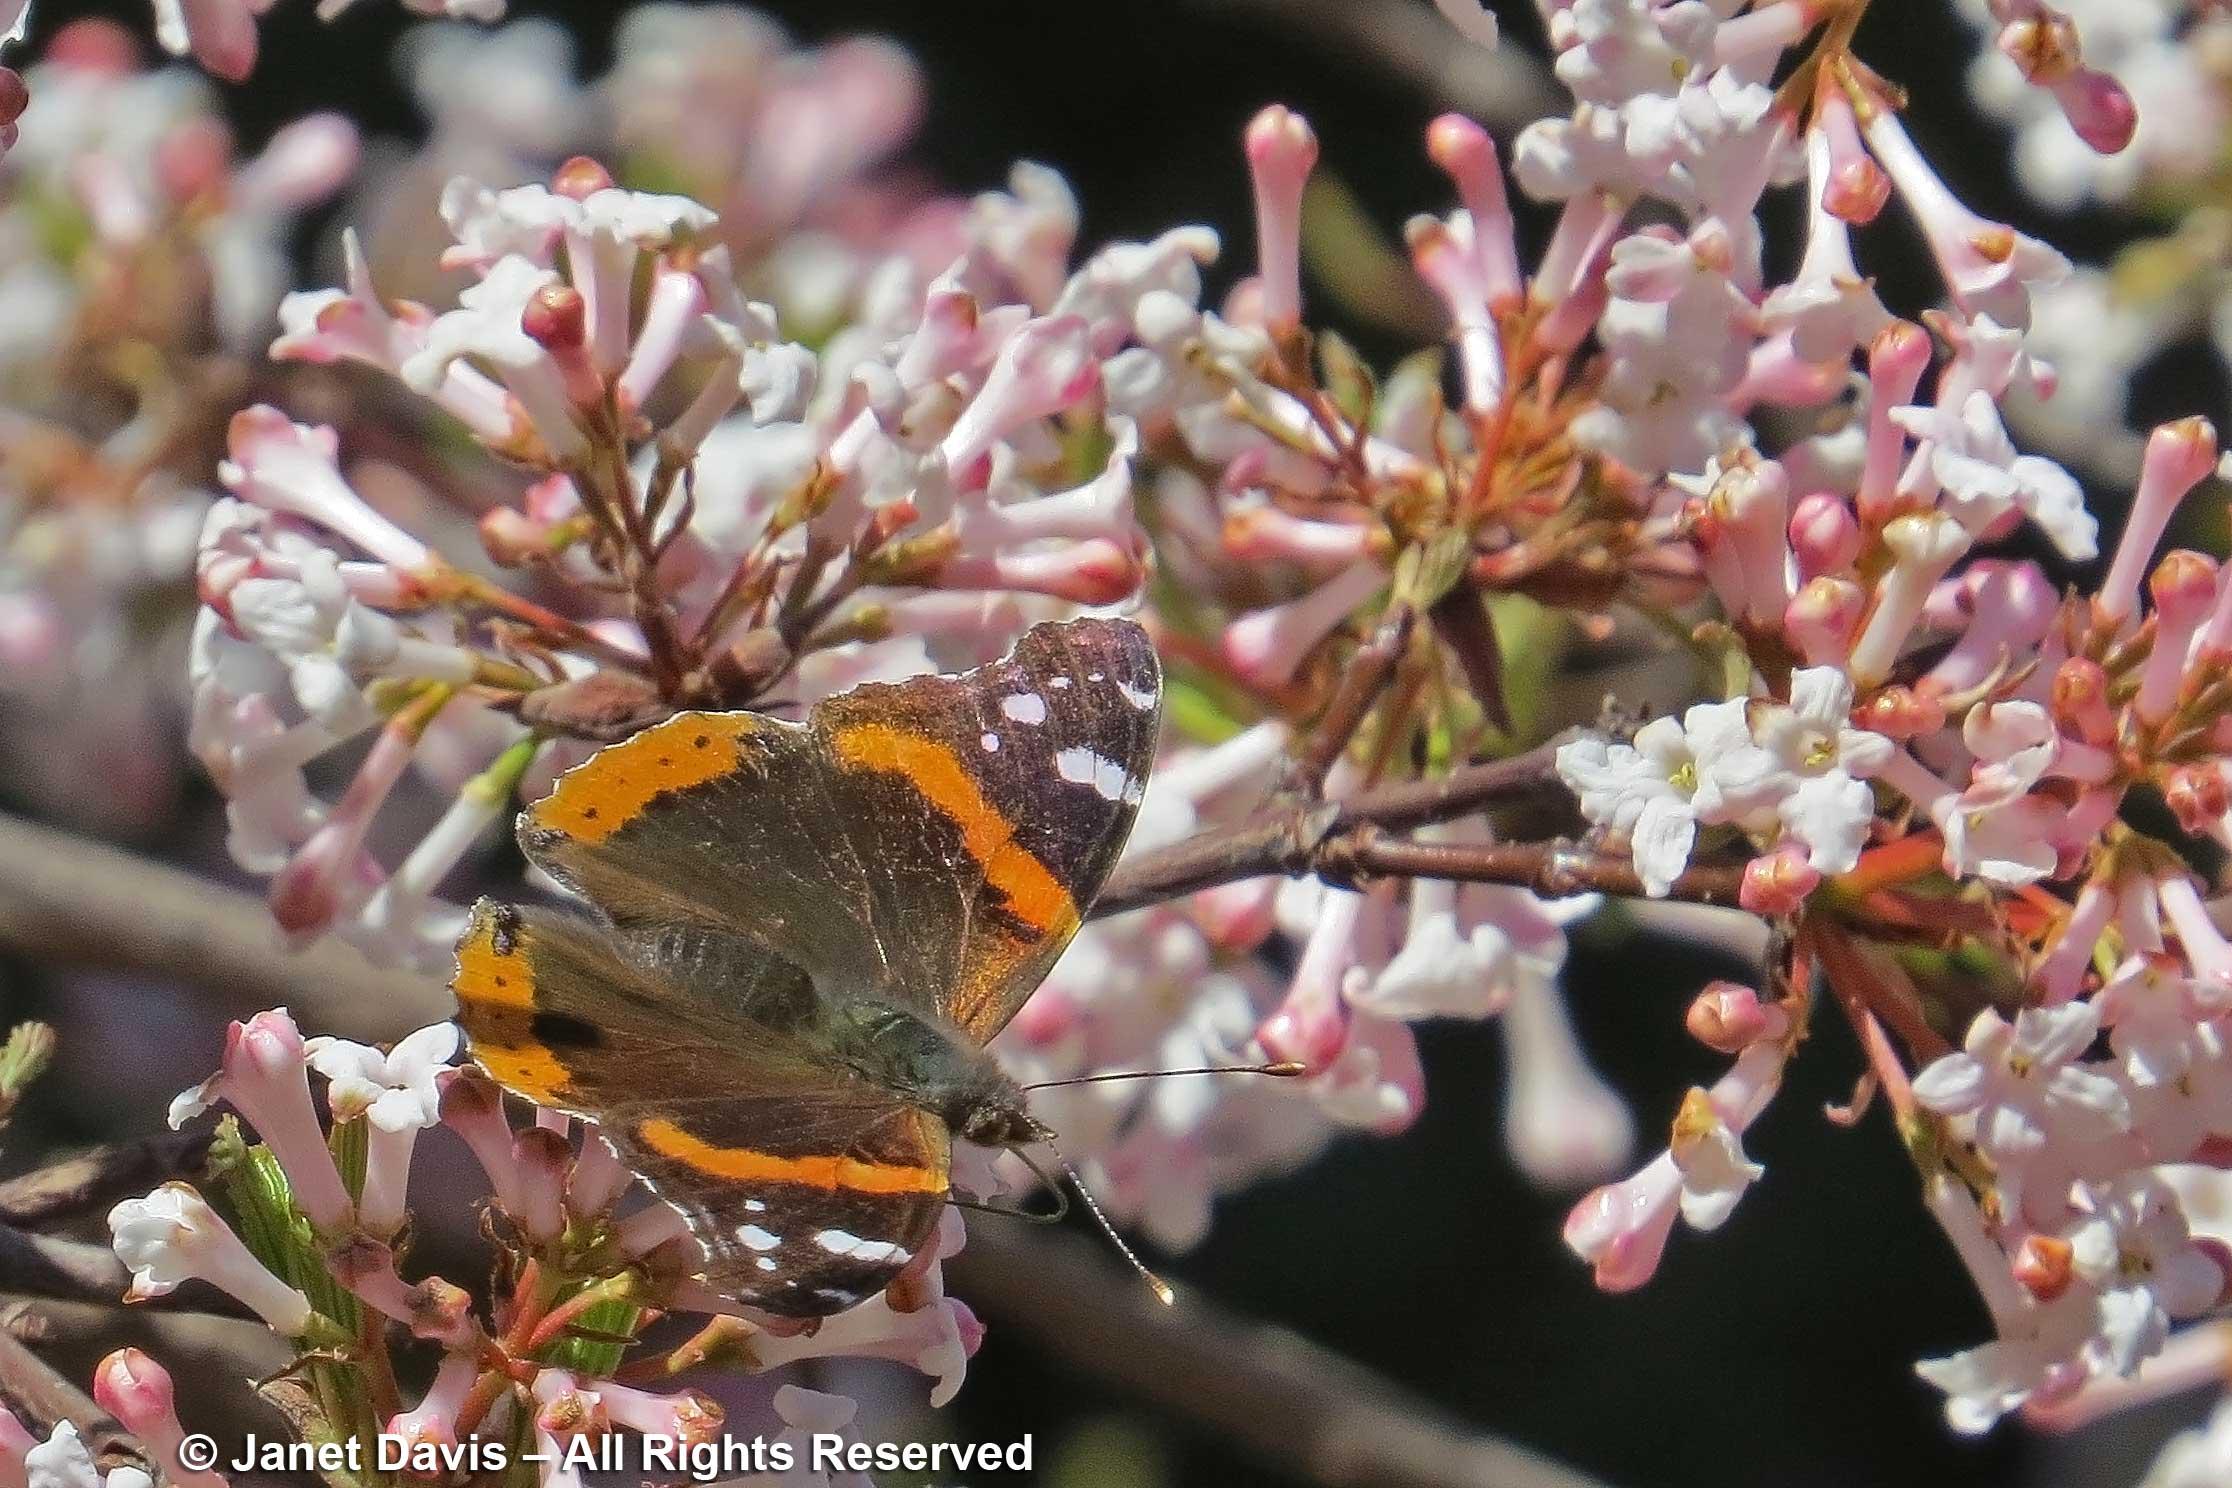 Red admiral butterfly-Vanessa atalanta-on Viburnum farreri